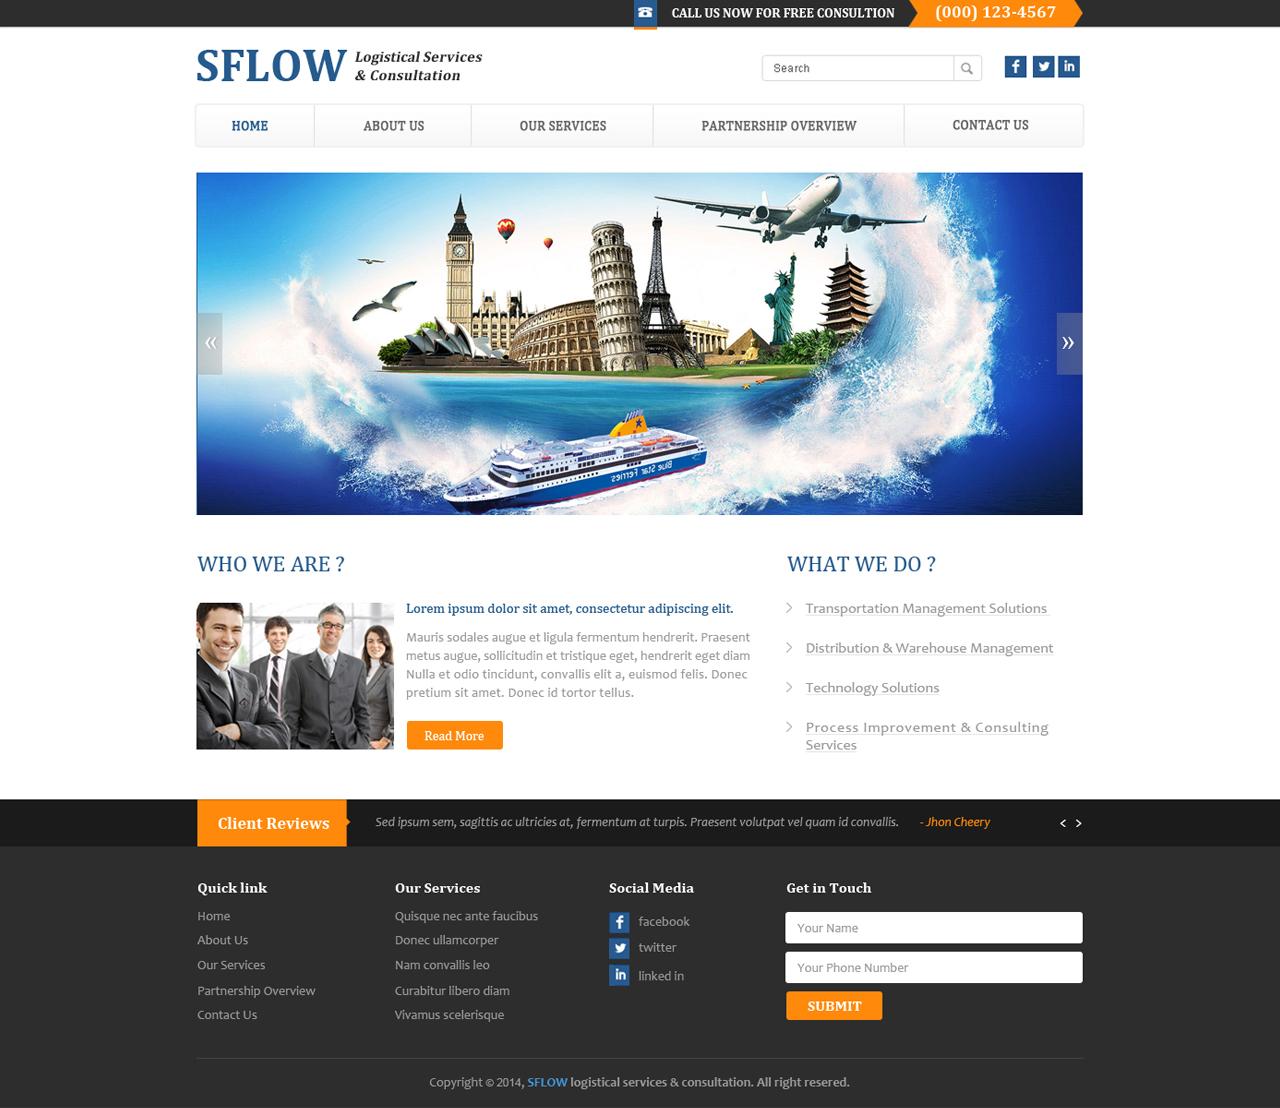 Business Web Design for SFLOW Logistics by Josh-Toto | Design #3163122